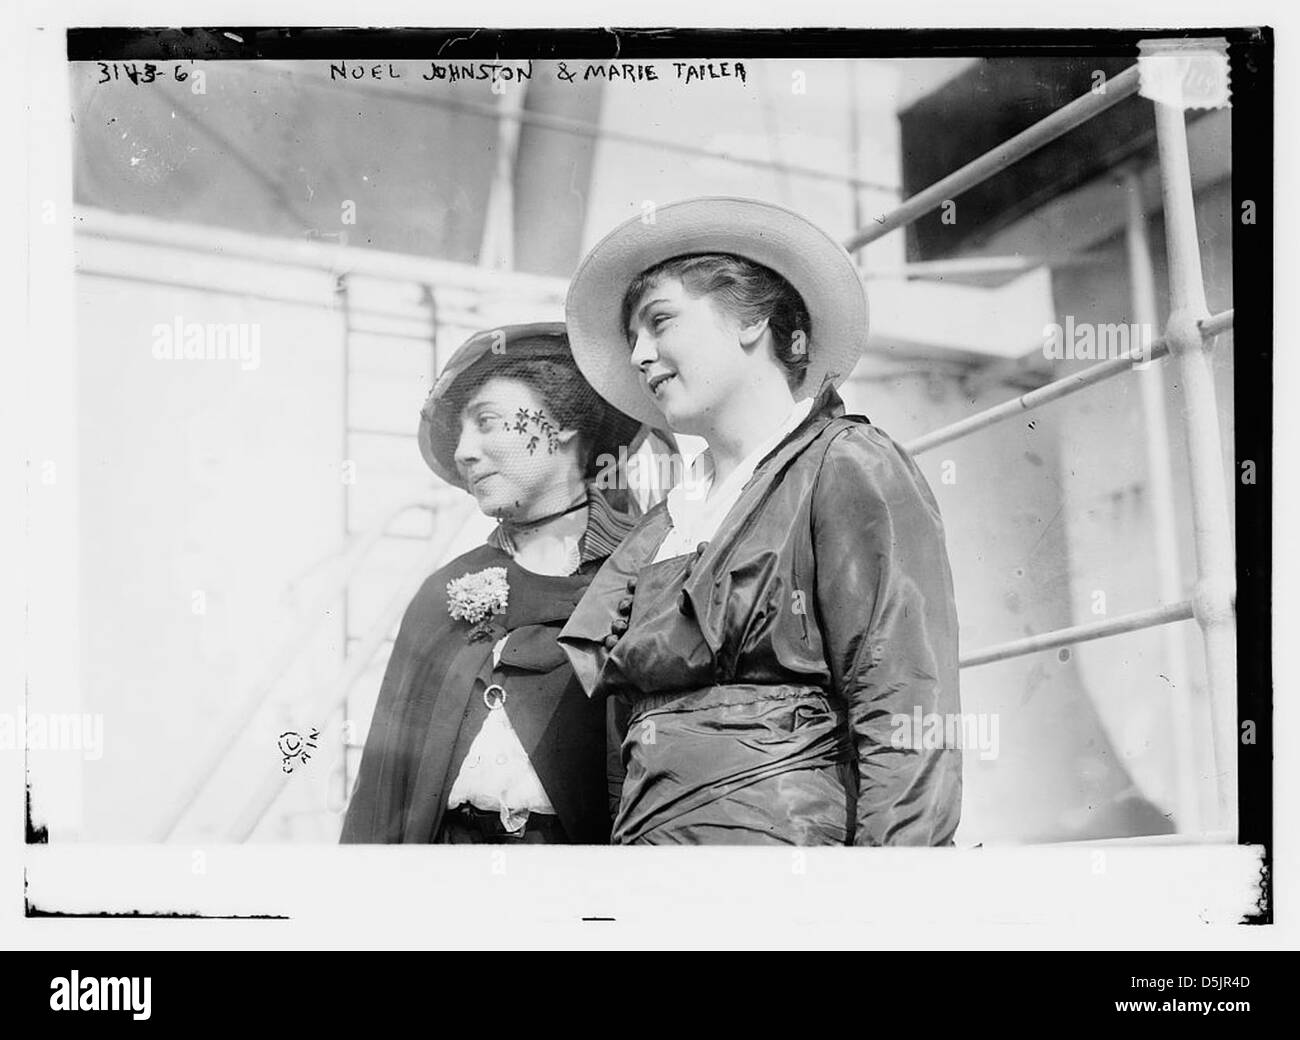 Noel Johnston and Marie Tailer (LOC) - Stock Image